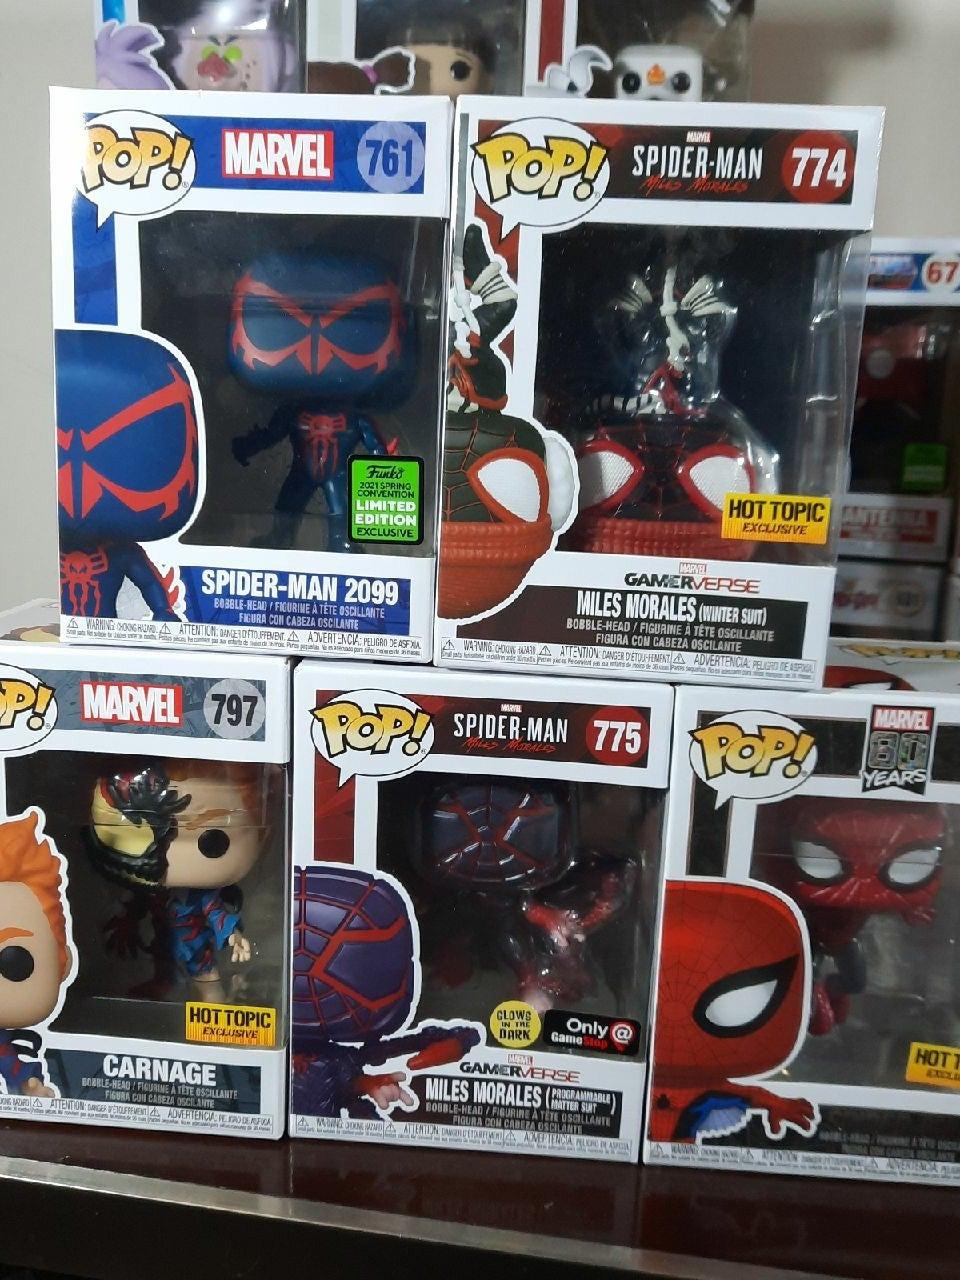 Spider-Man Universe Funko Pop exclusives